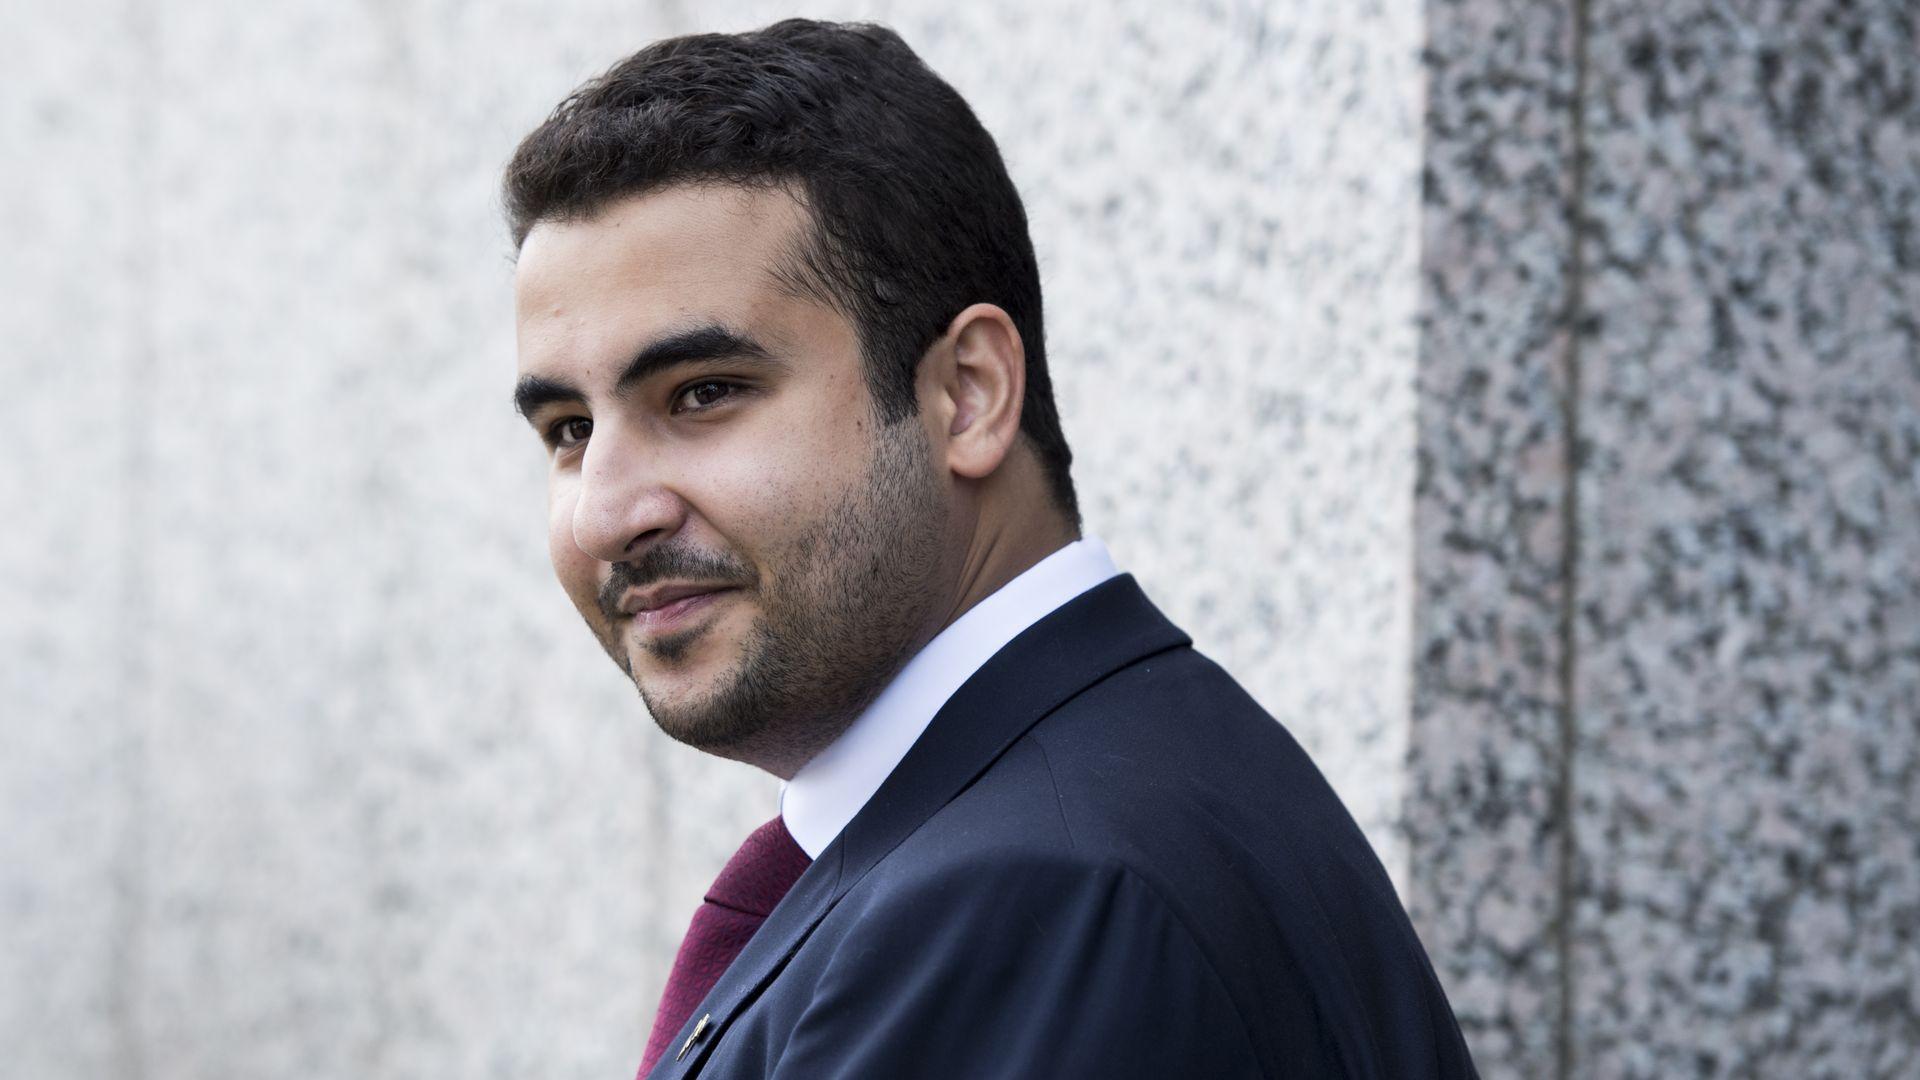 Saudi Ambassador to the U.S. Prince Khalid bin Salman bin Abdulaziz